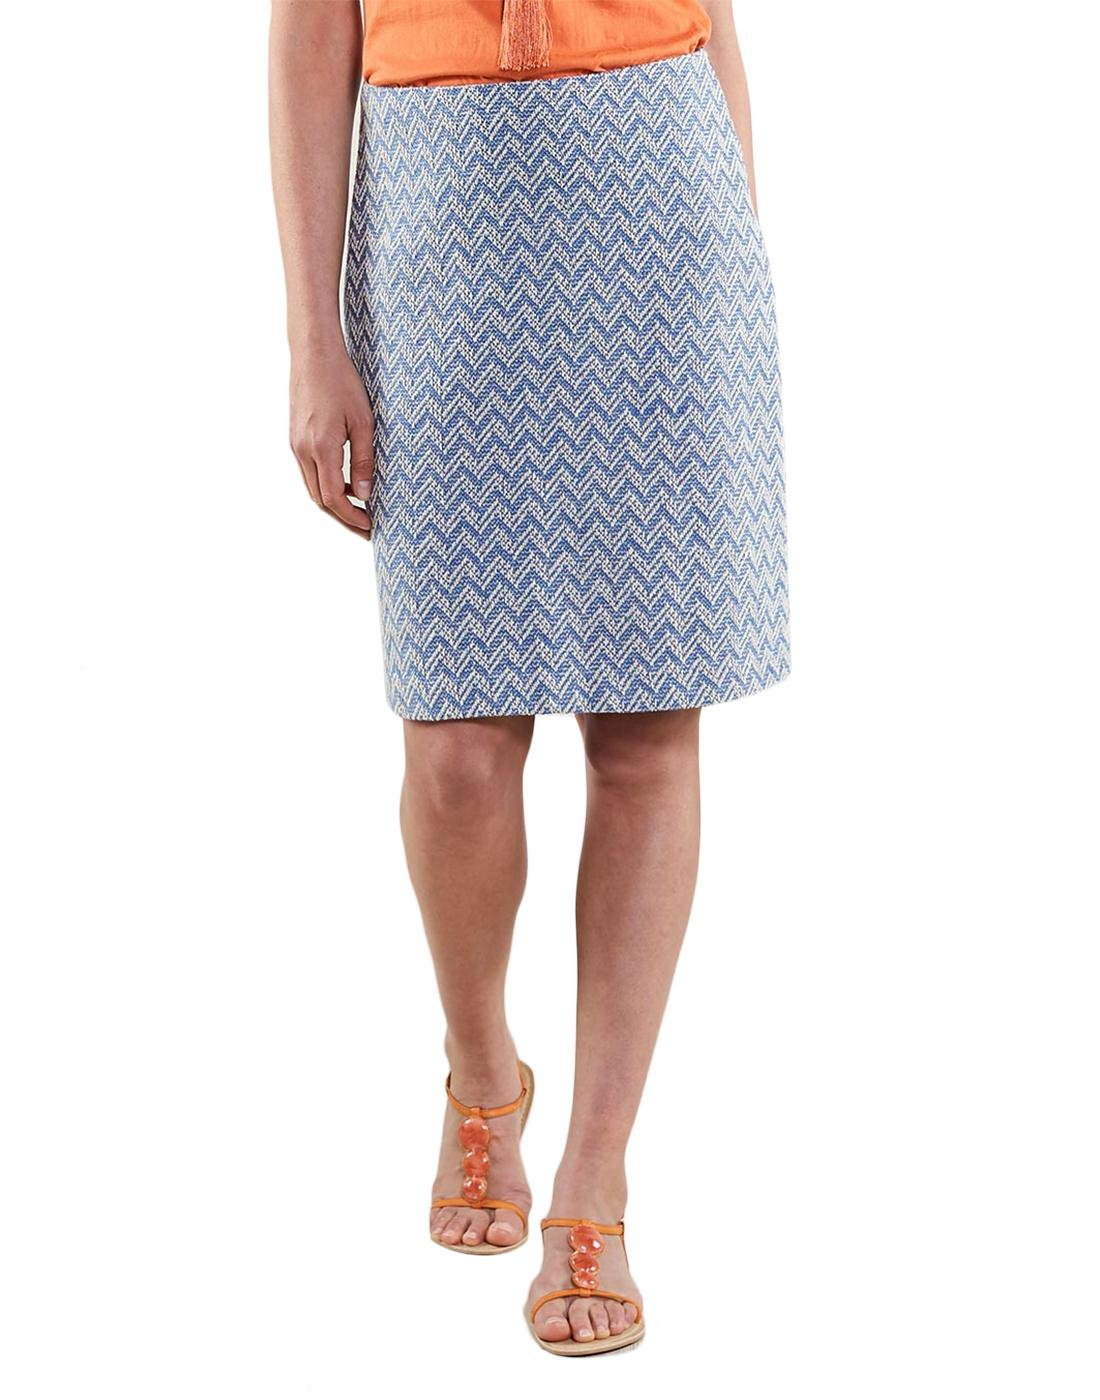 NOMADS Retro 1970s Handloom Tailored Pencil Skirt